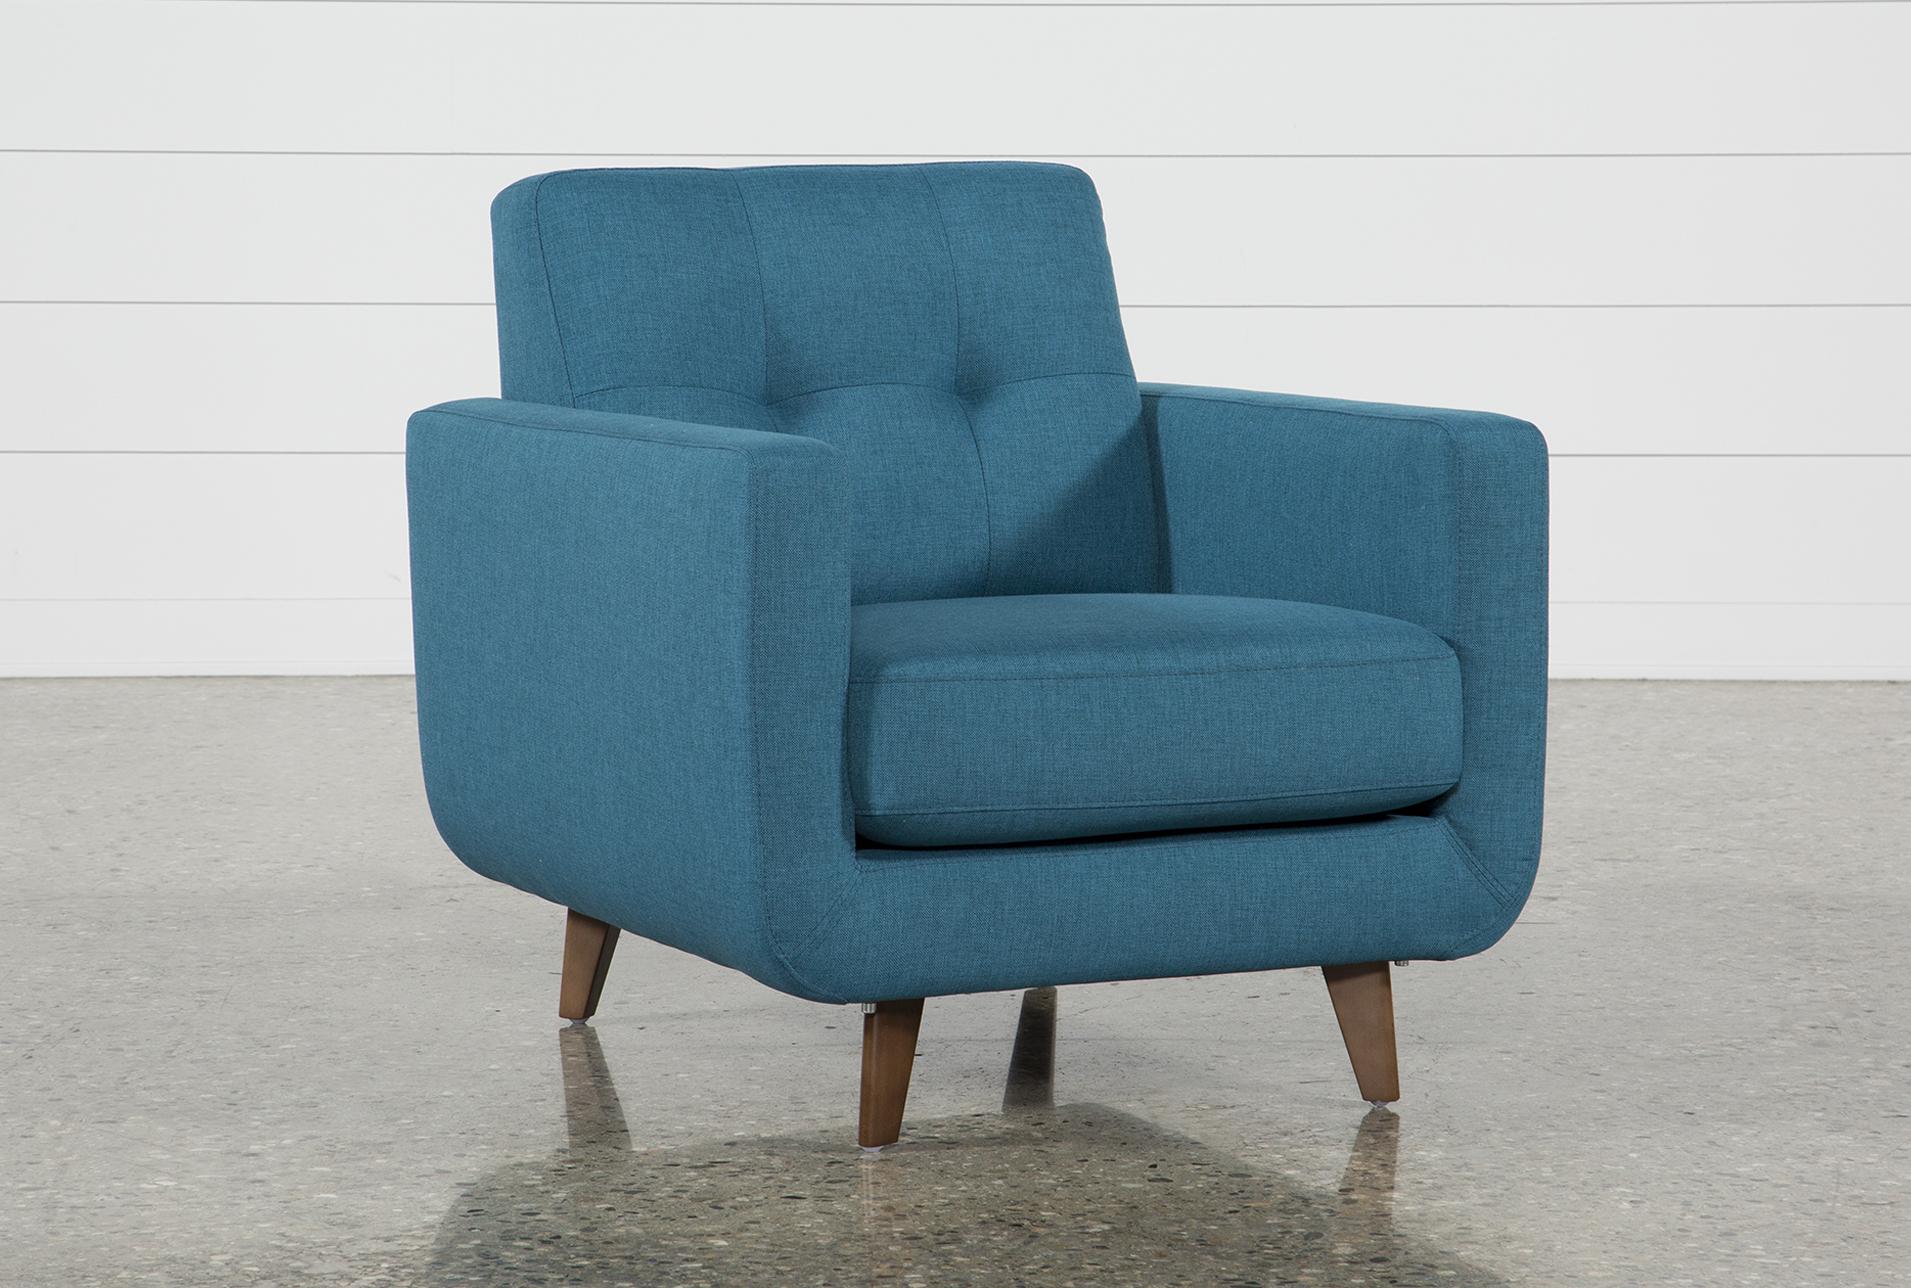 Allie Jade Chair | Living Spaces